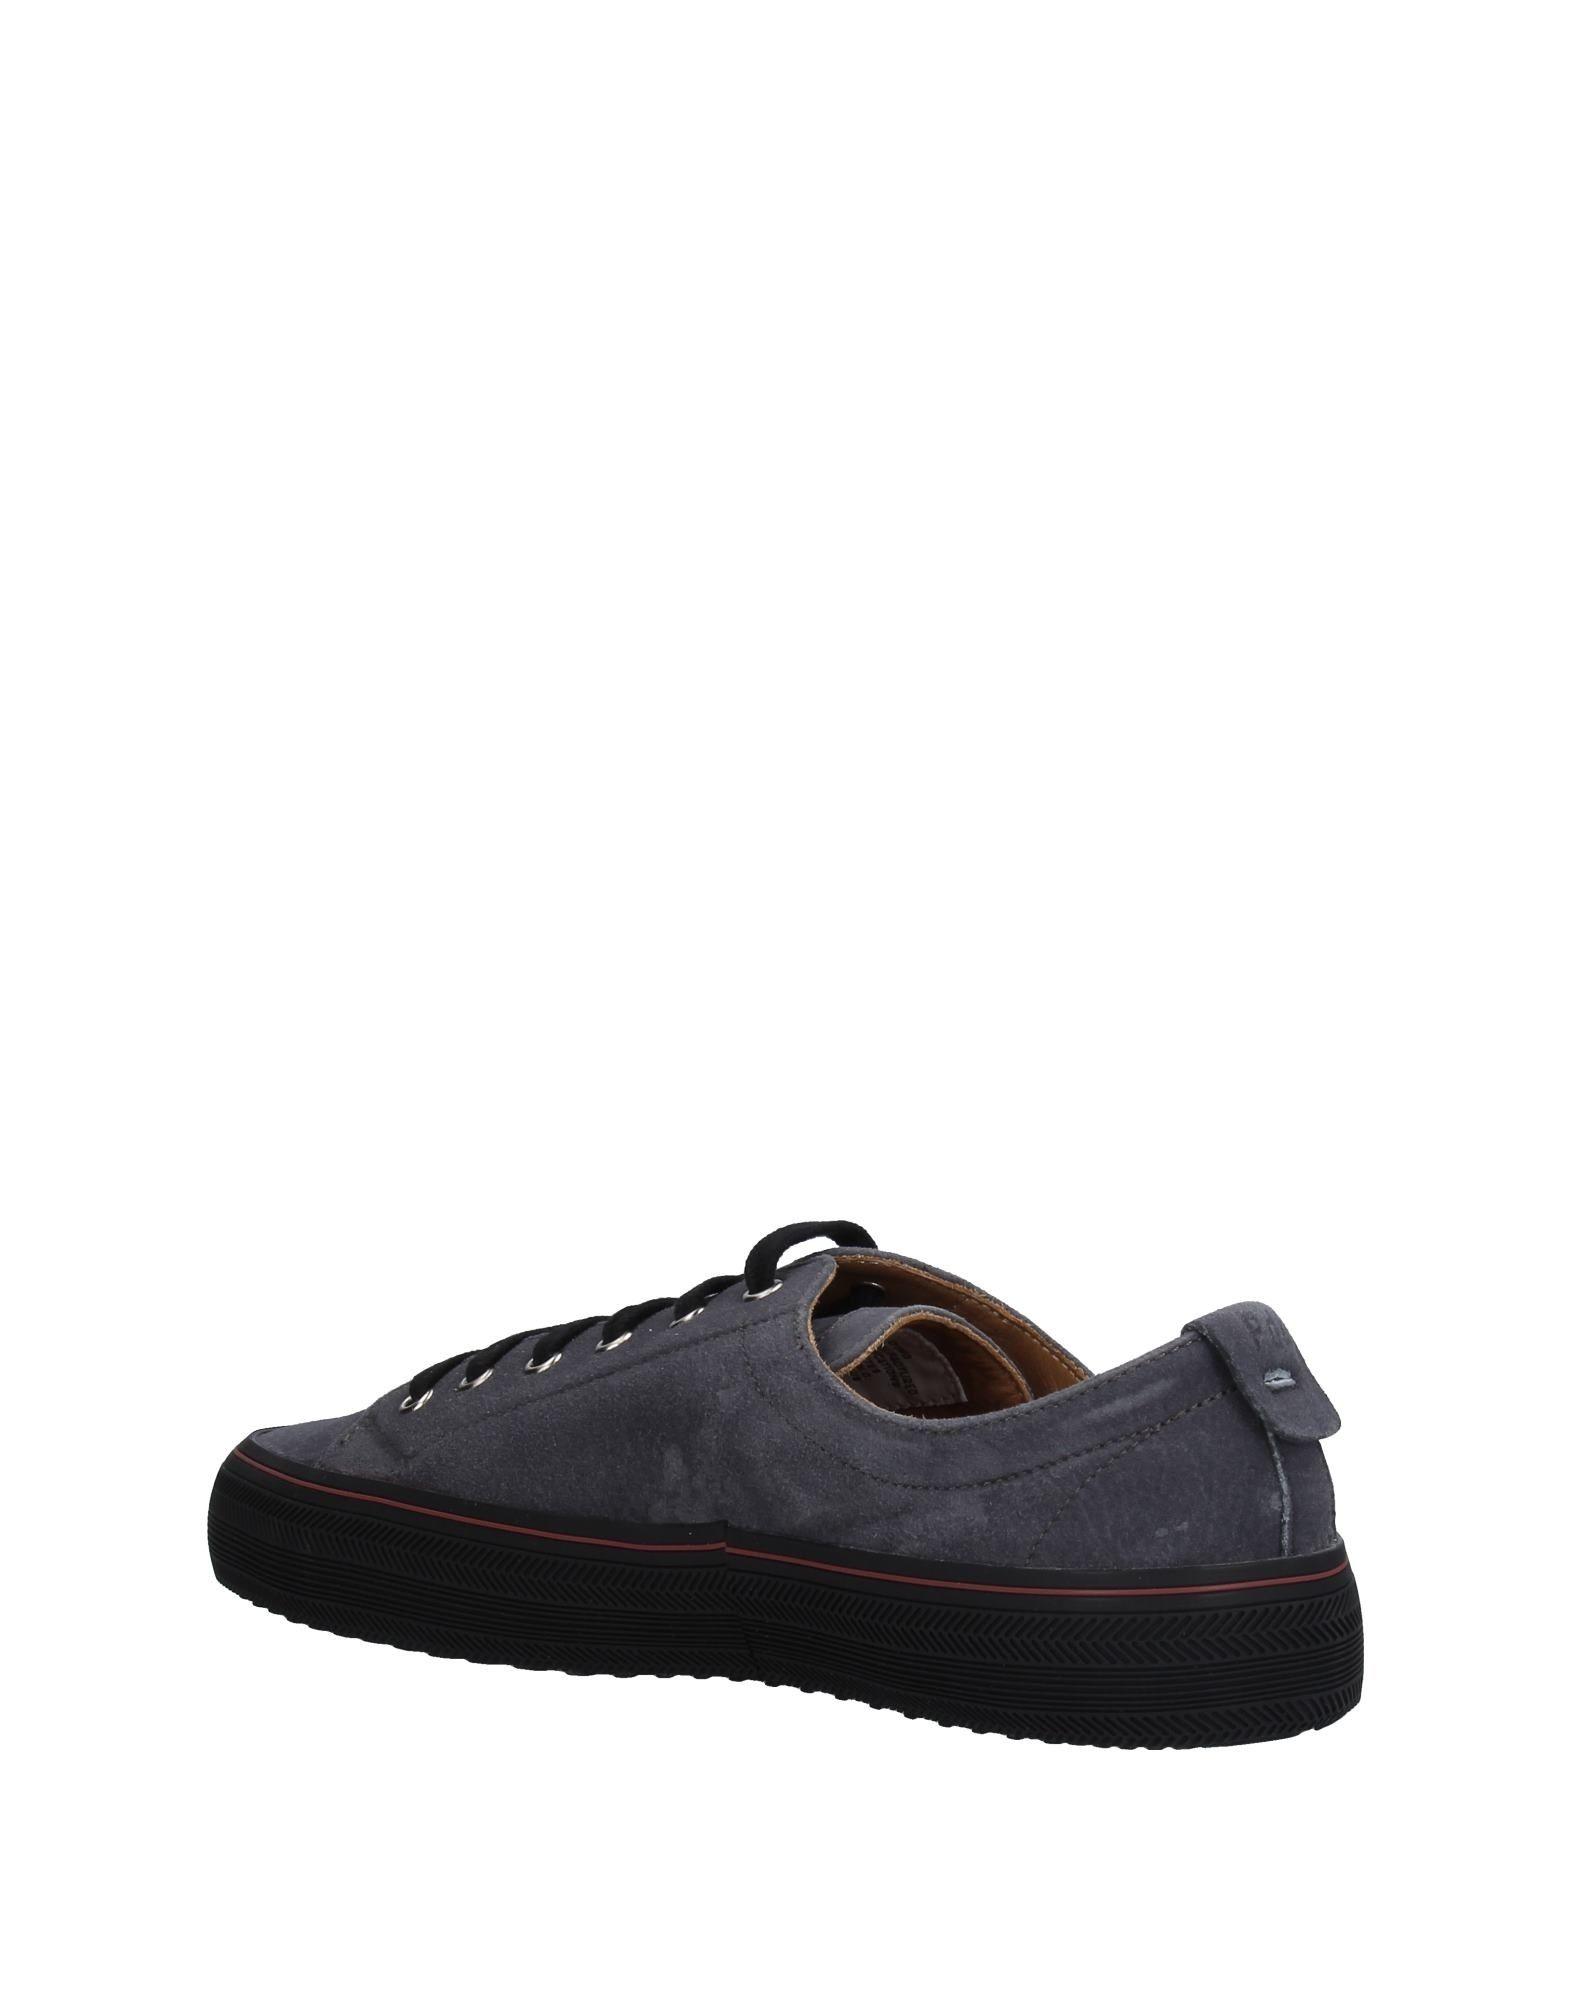 Pantofola D'oro  Sneakers Herren  11222646LK  D'oro 57e4af